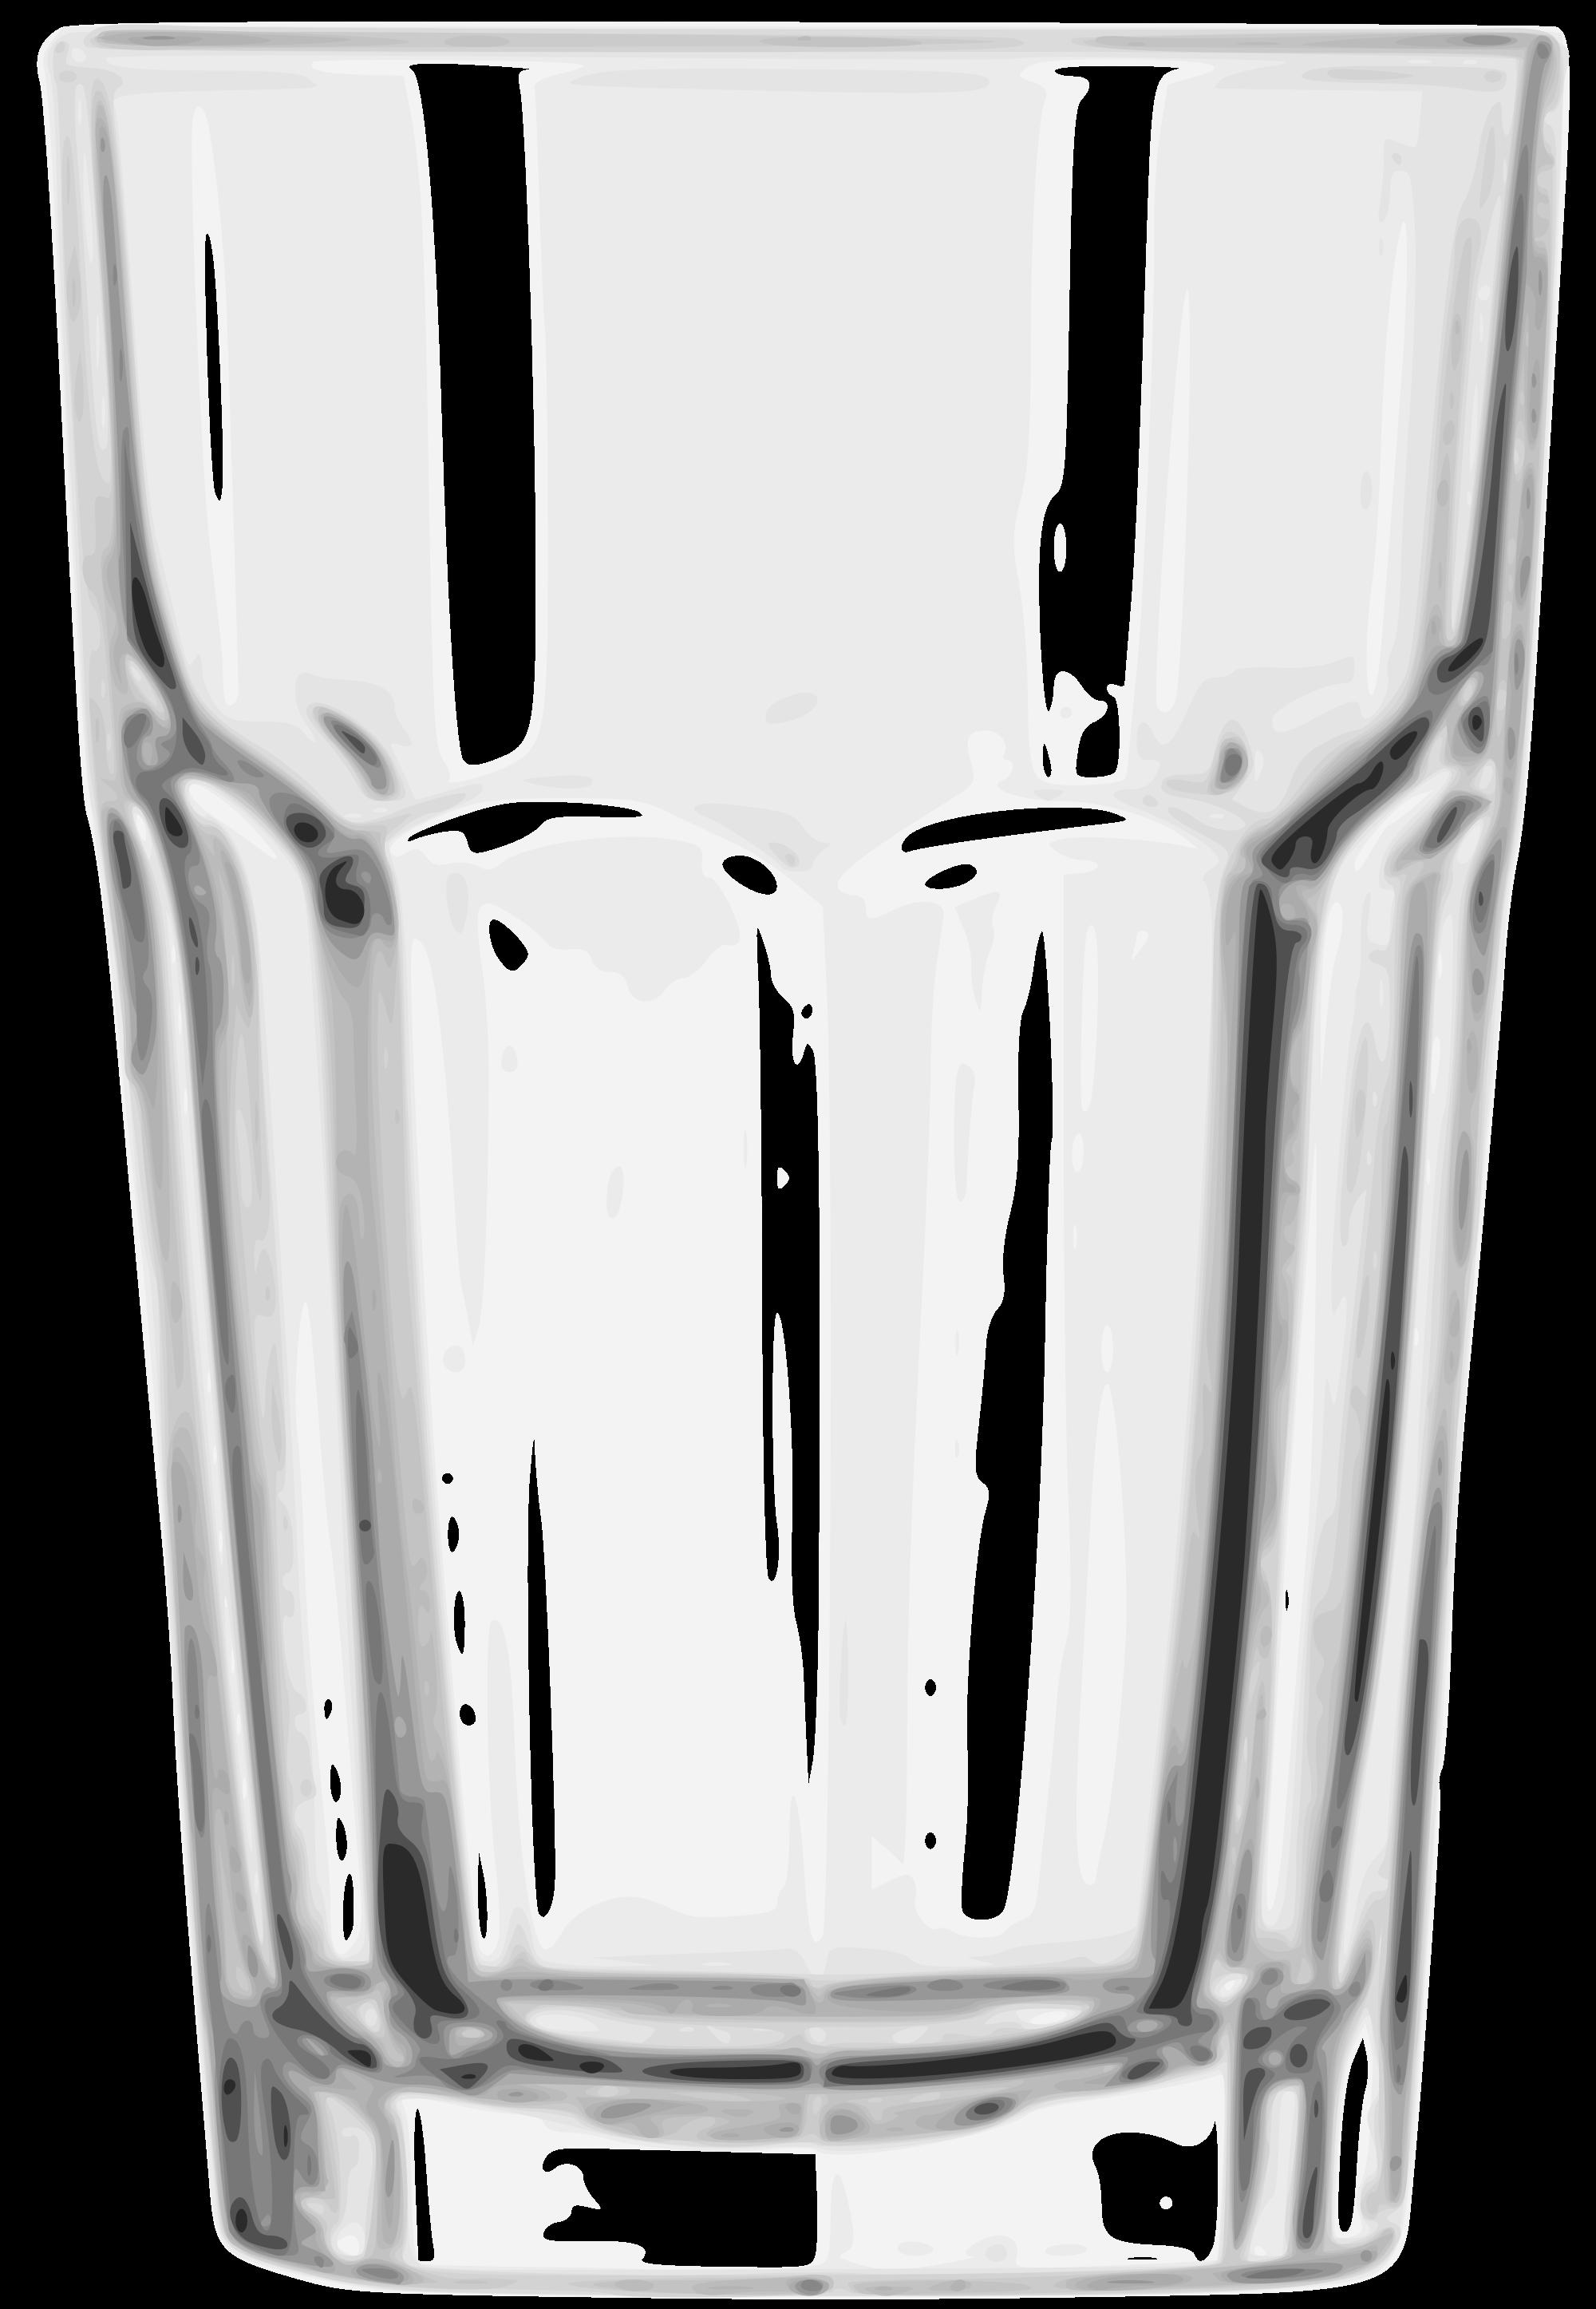 Beverage glass tumbler svg. Glasses clipart file